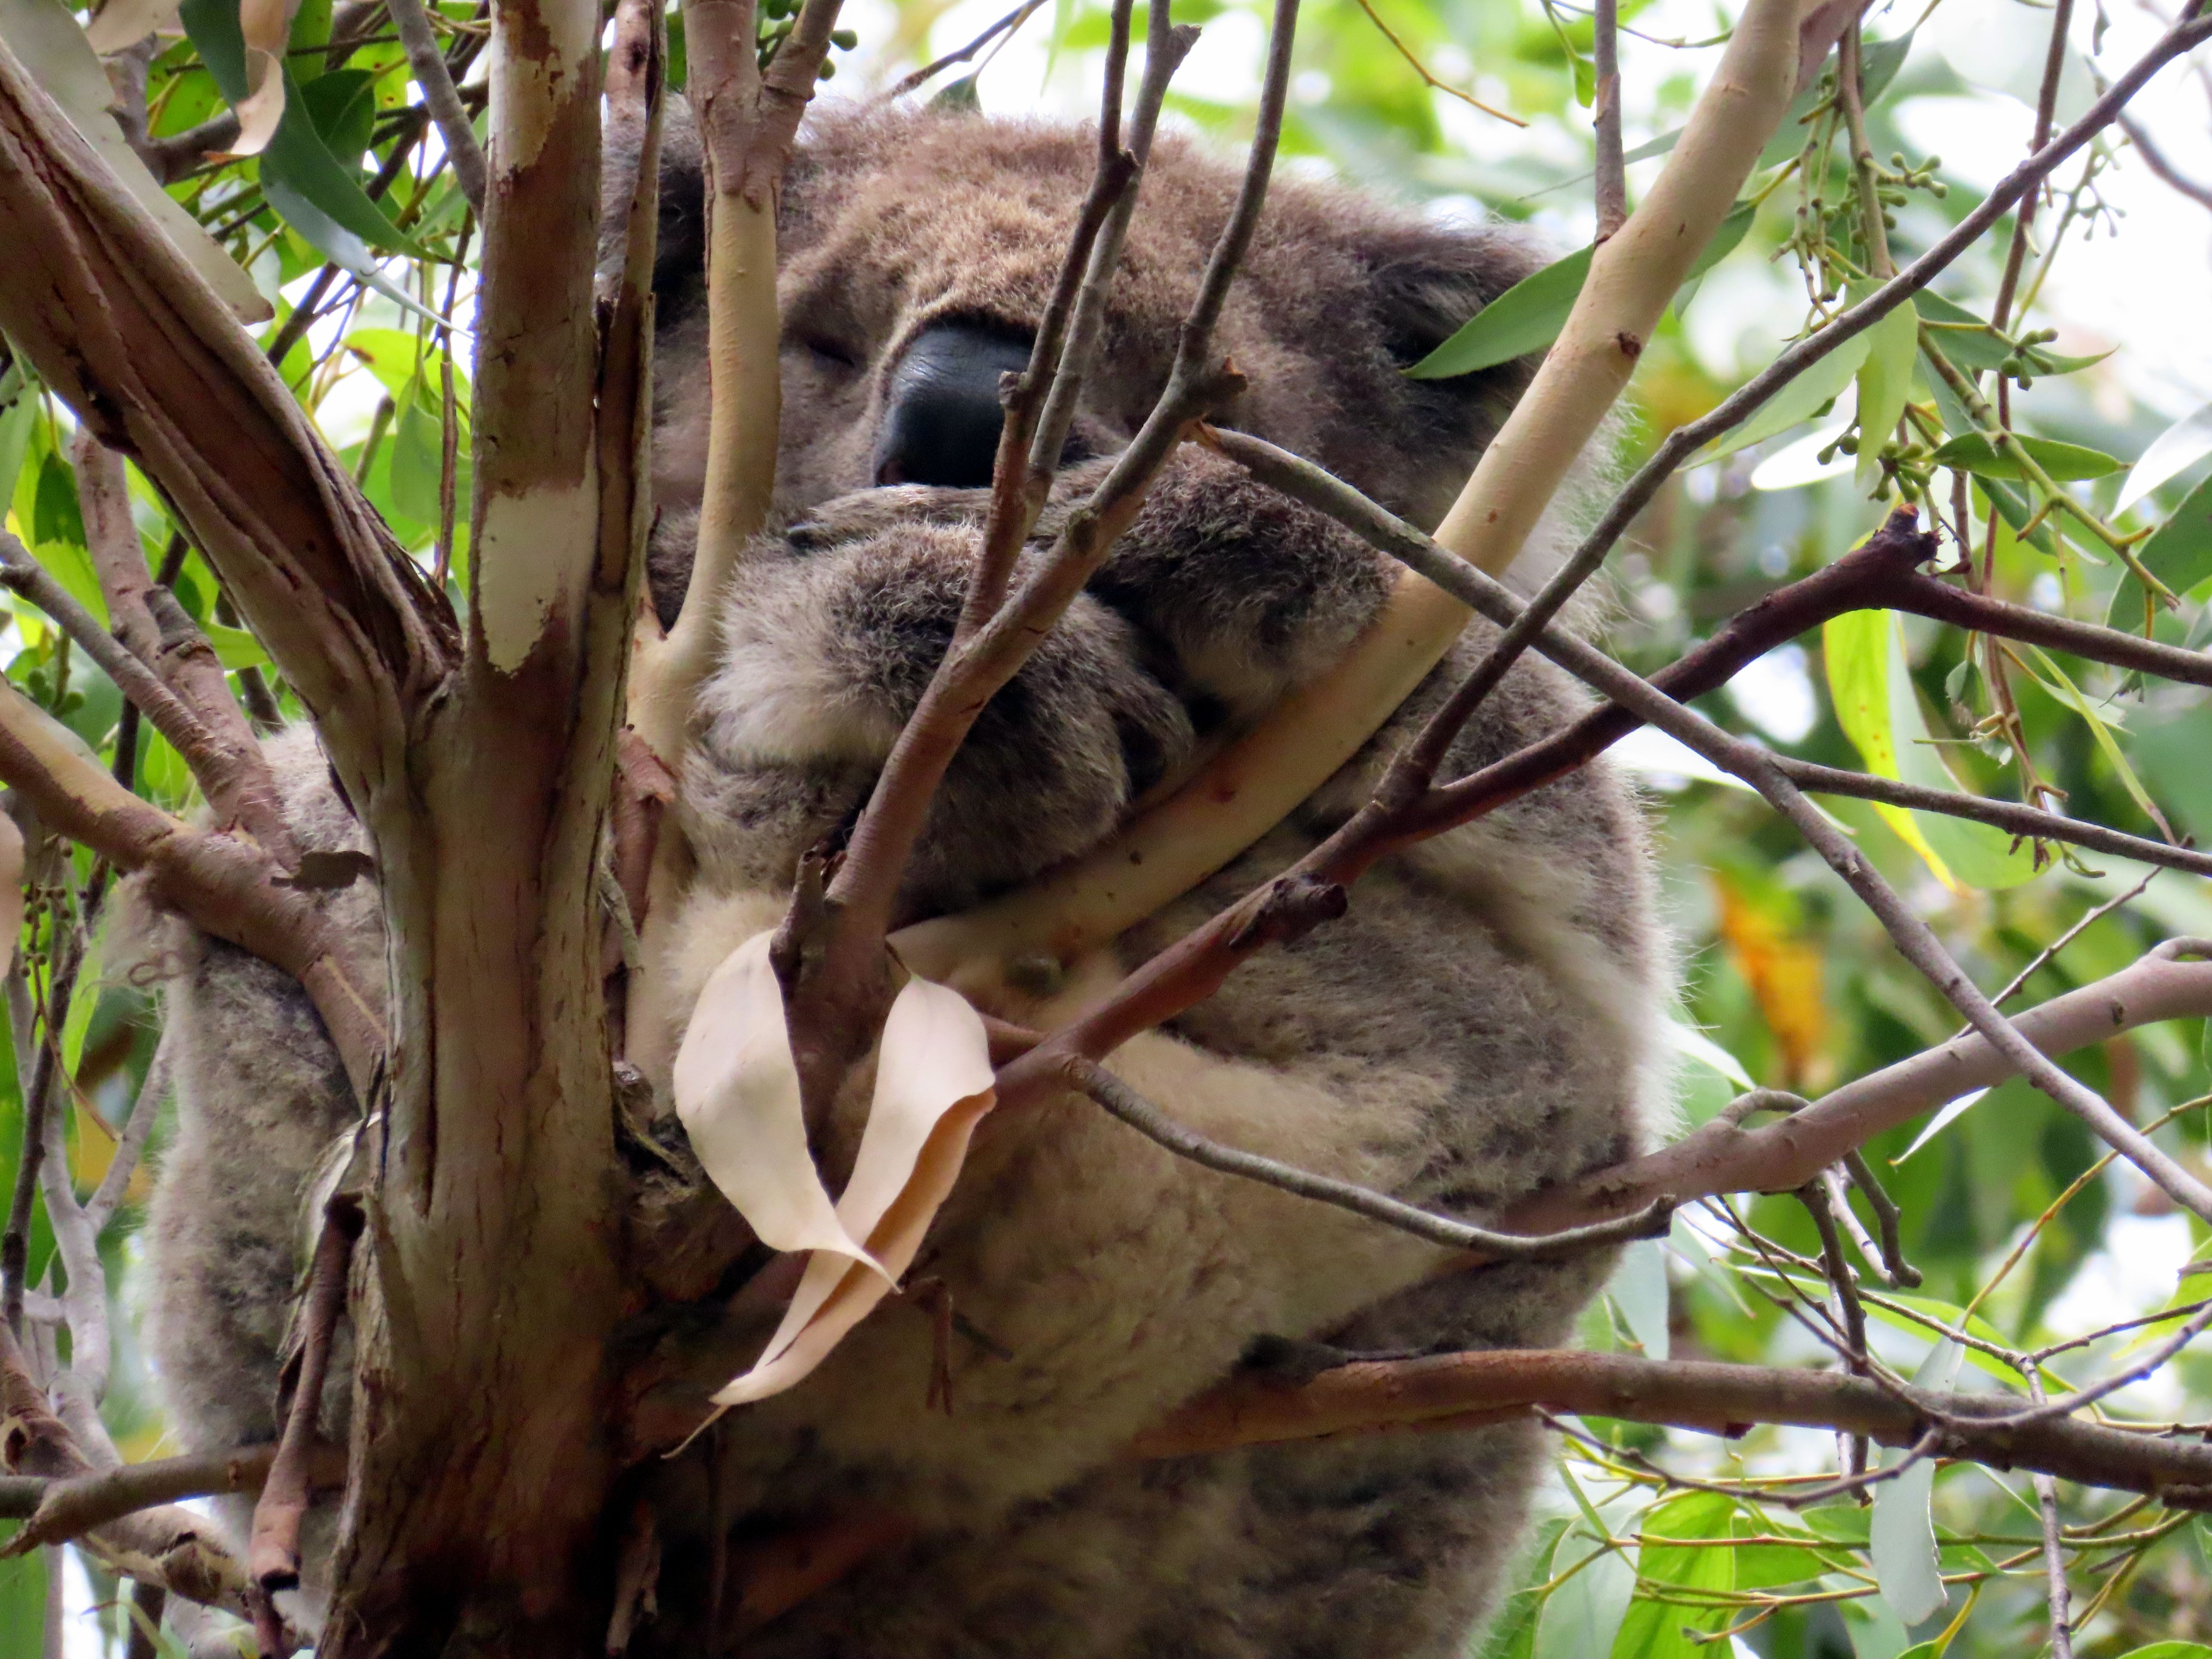 Koala hugging a joey at Cape Otway. A joey is developed in ... - photo#21